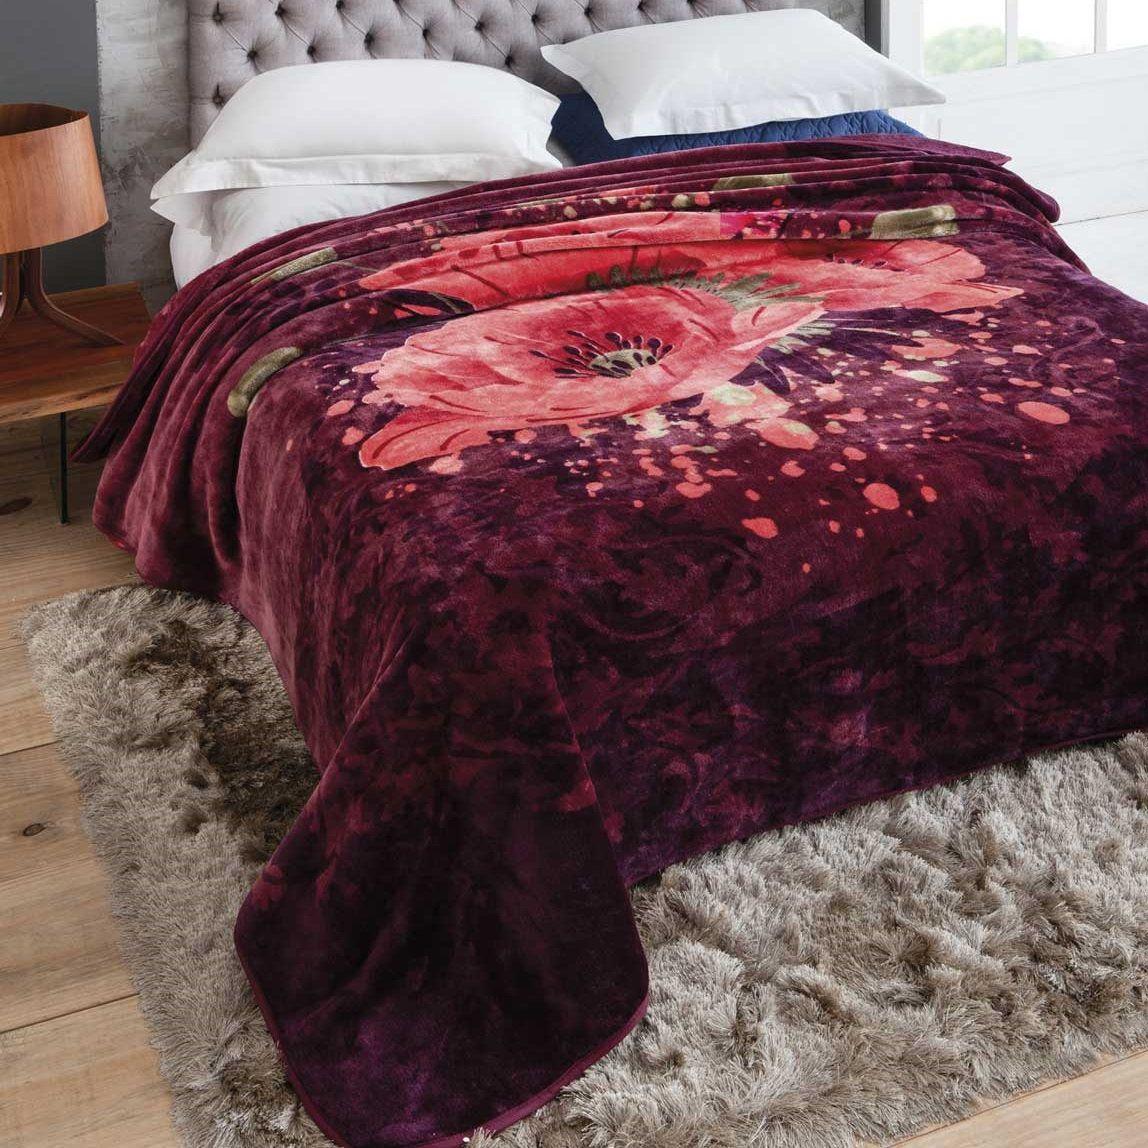 Cobertor Jolitex Casal King Raschel Toque Macio Fragrancia